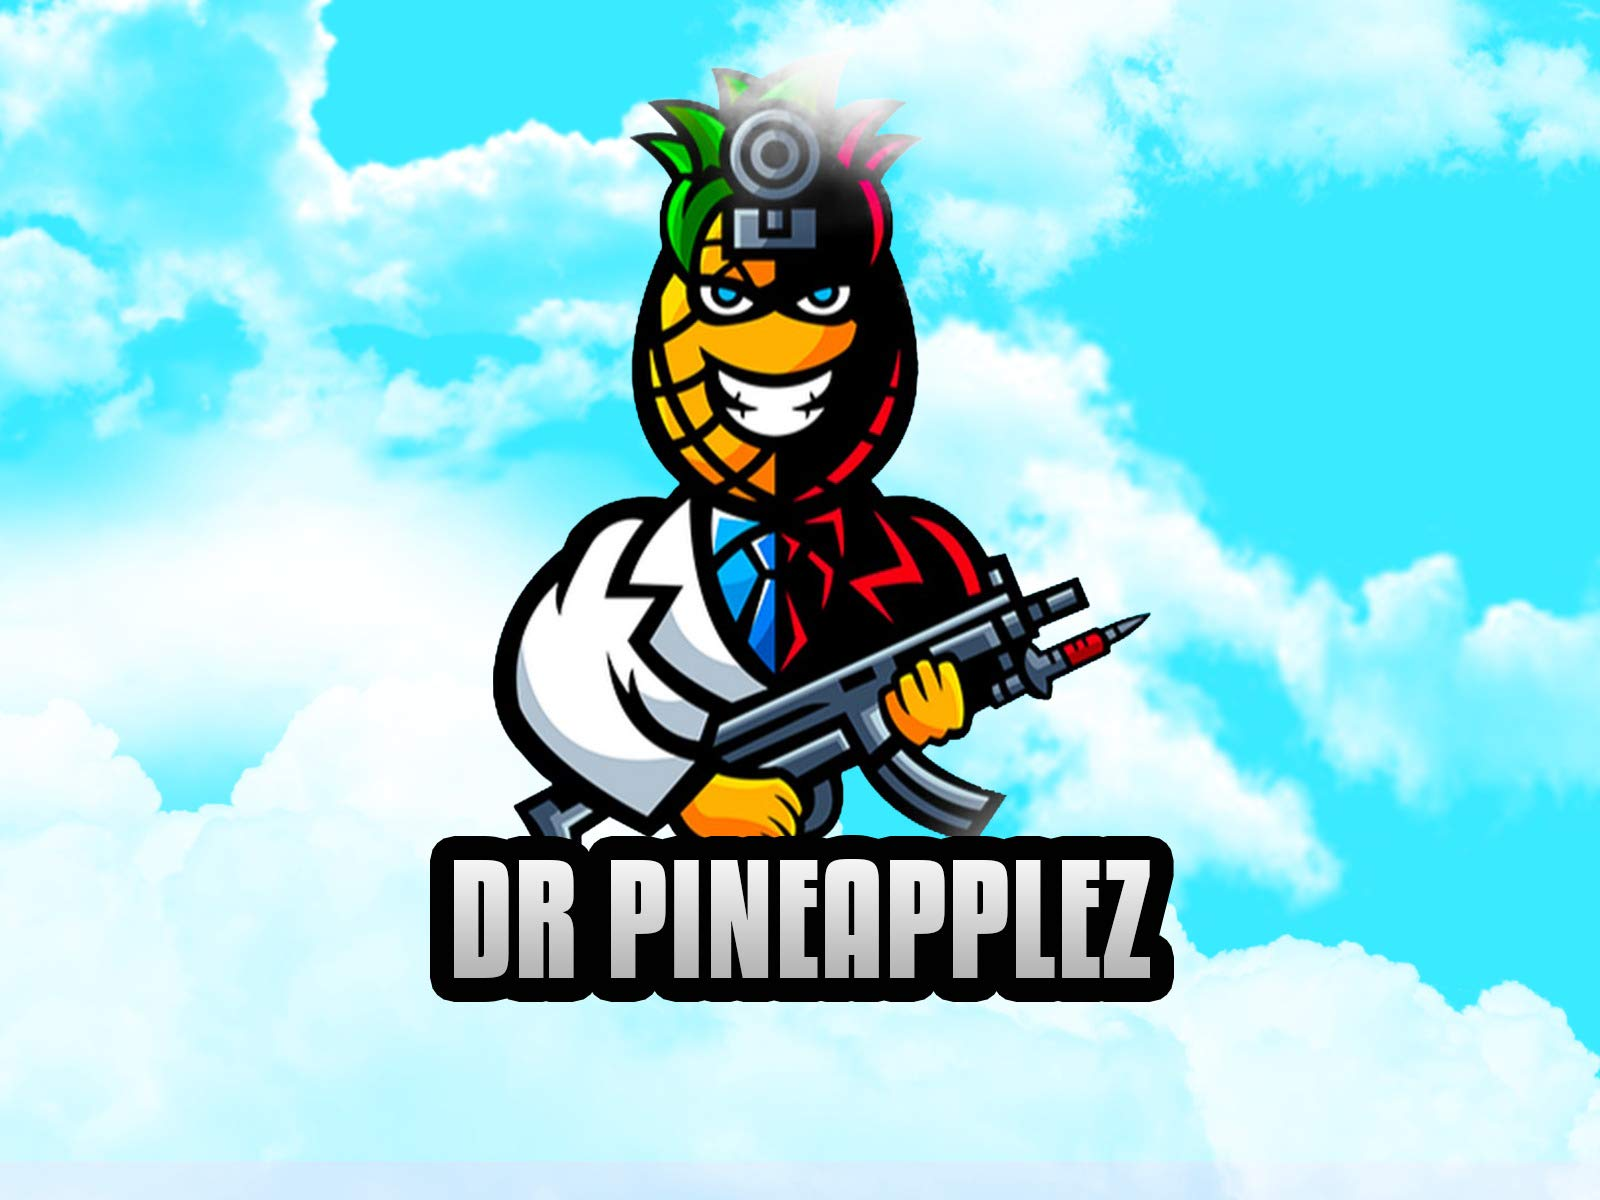 Amazon co uk: Watch Clip: Dr Pineapplez | Prime Video